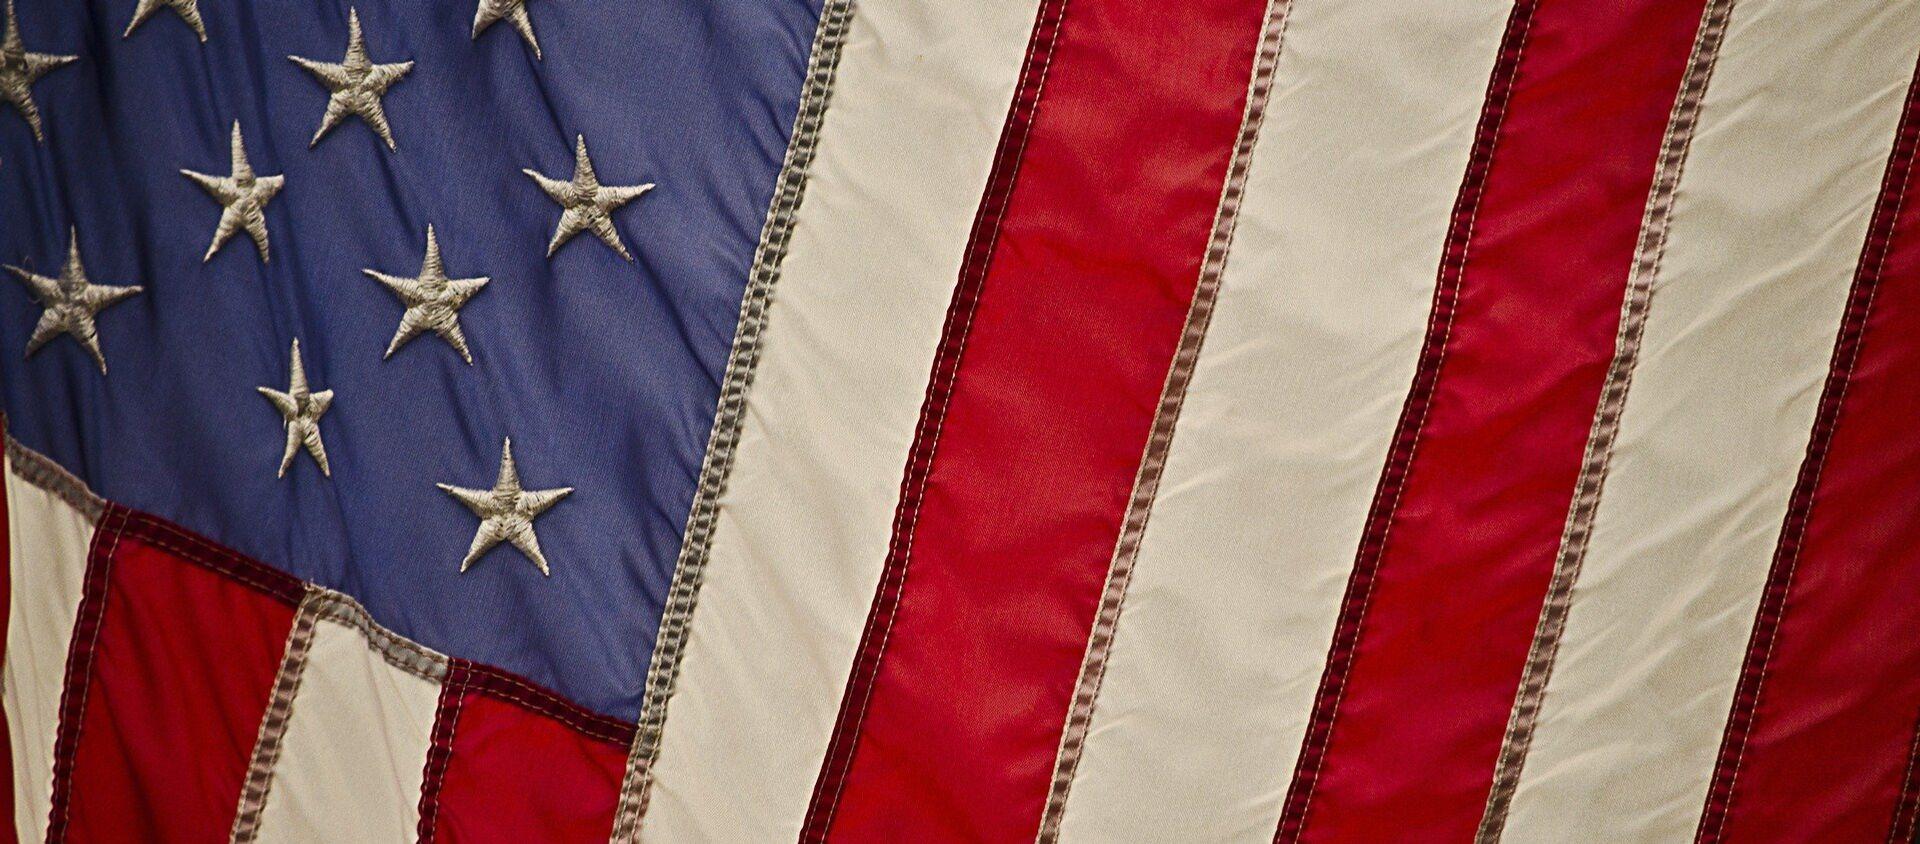 La bandera de EEUU - Sputnik Mundo, 1920, 03.07.2020